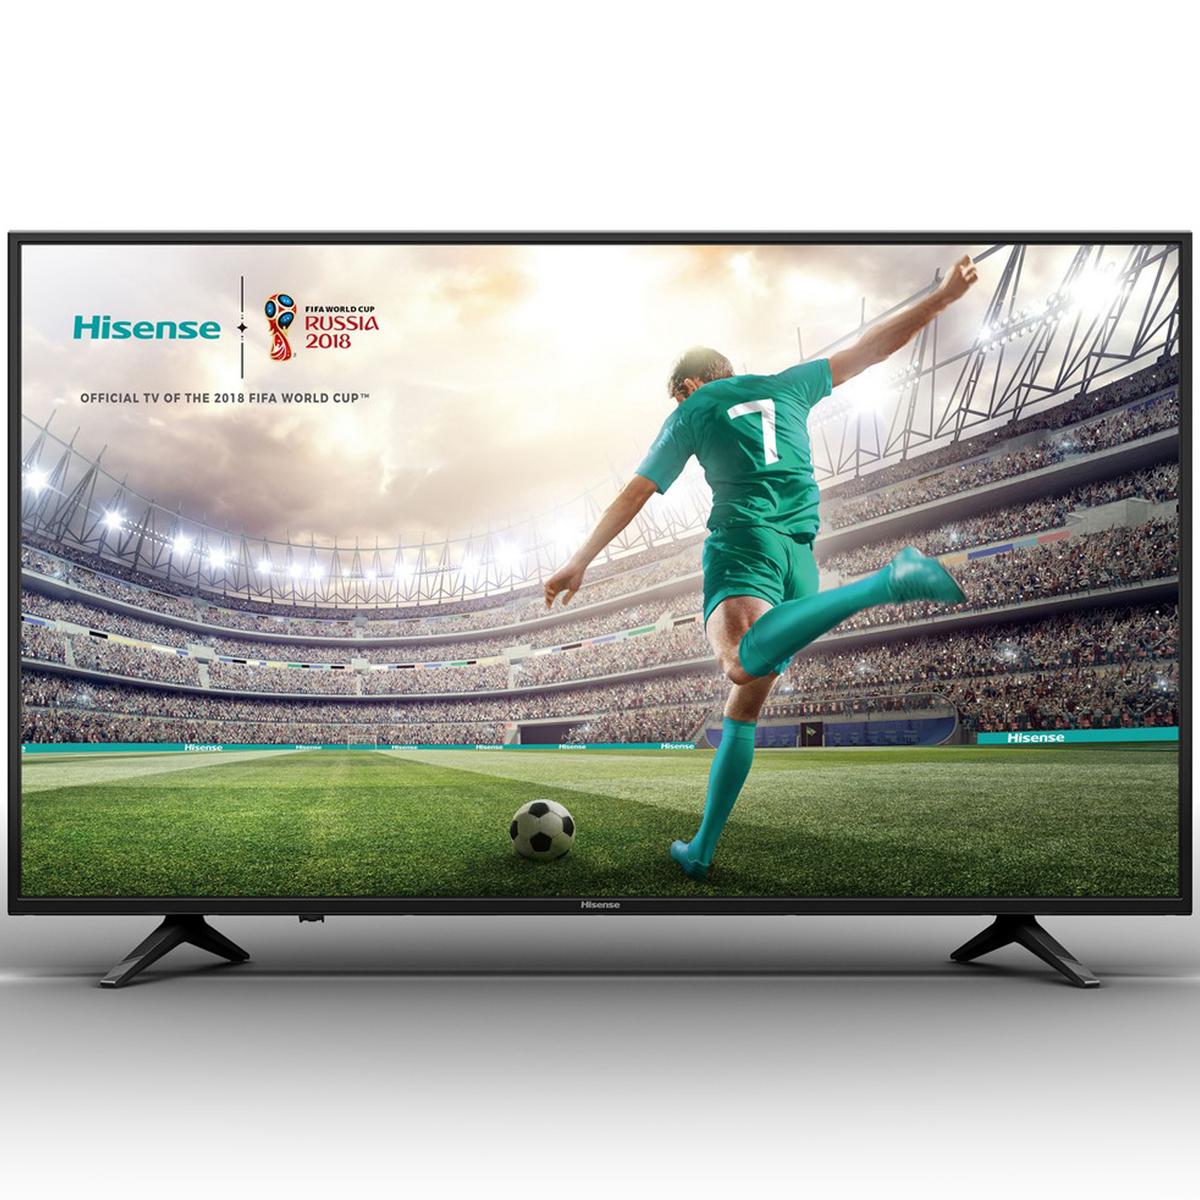 Buy Hisense Ultra HD 4K Smart LED TV 55A6100UW 55inch - 44